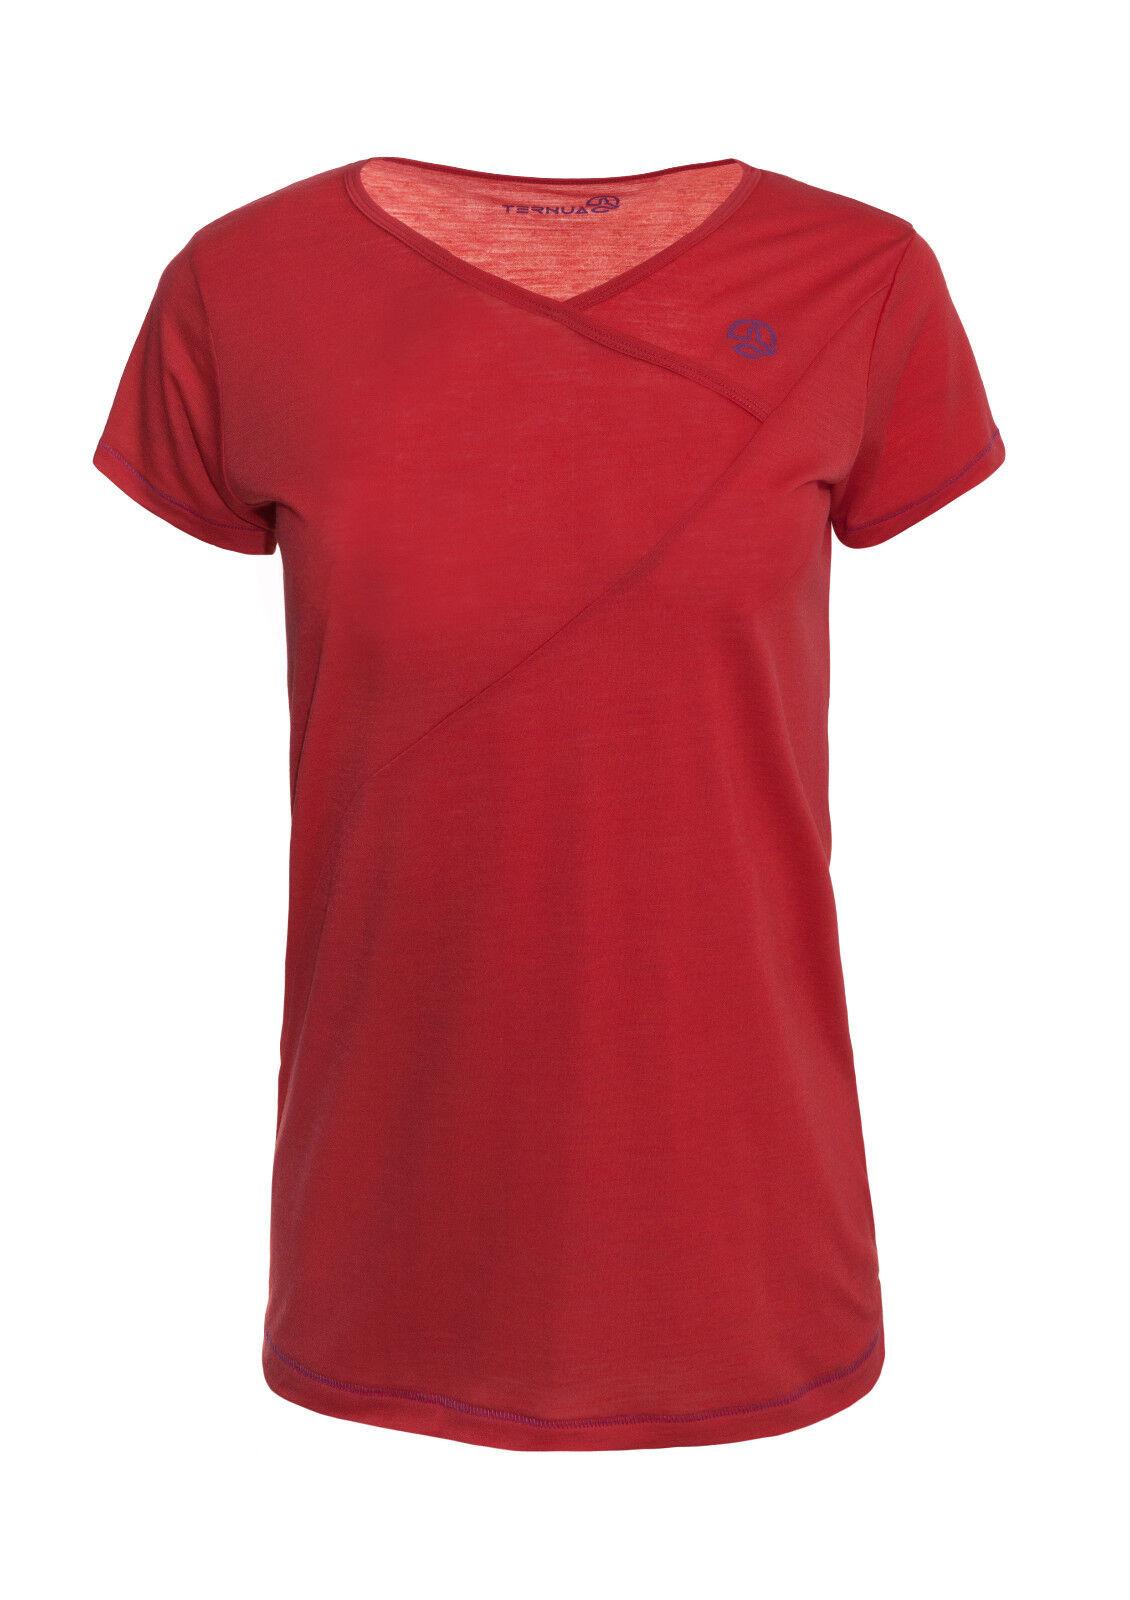 Ternua Stin merino camisa mujer-Al aire libre trepar senderismo fitness yoga